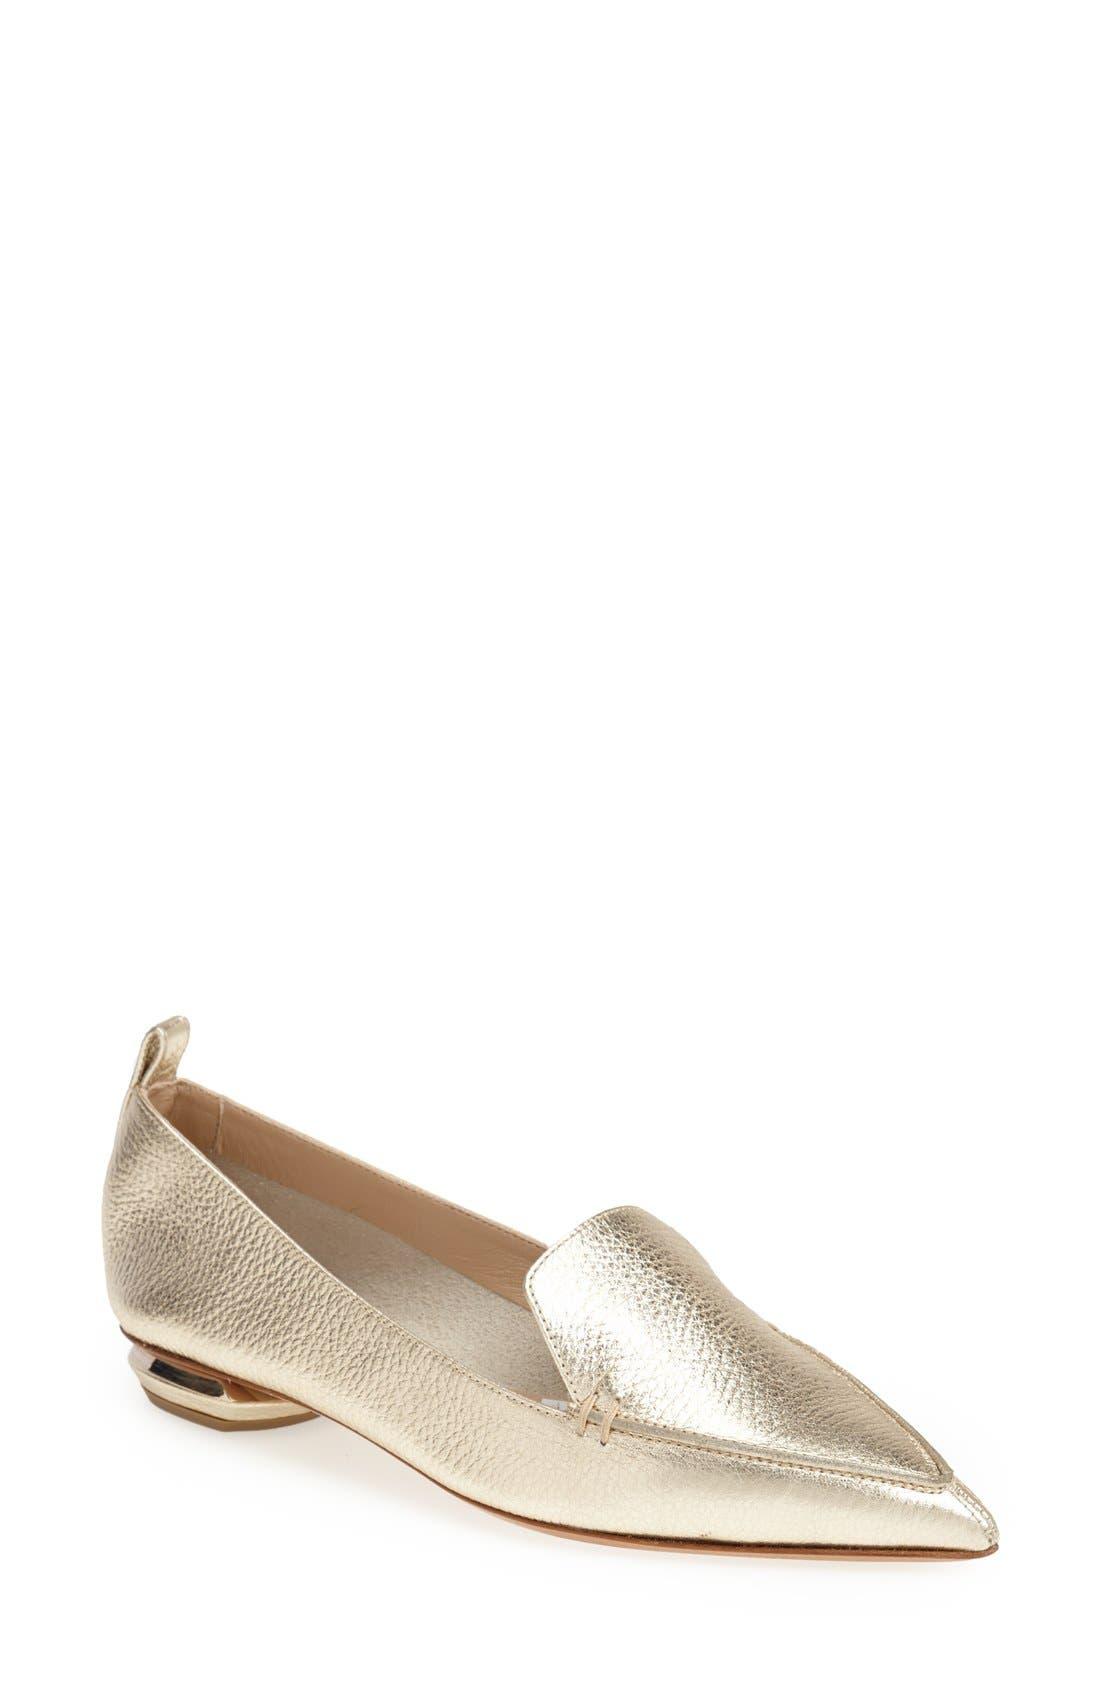 Alternate Image 1 Selected - Nicholas Kirkwood Pointed Toe Loafer (Women)